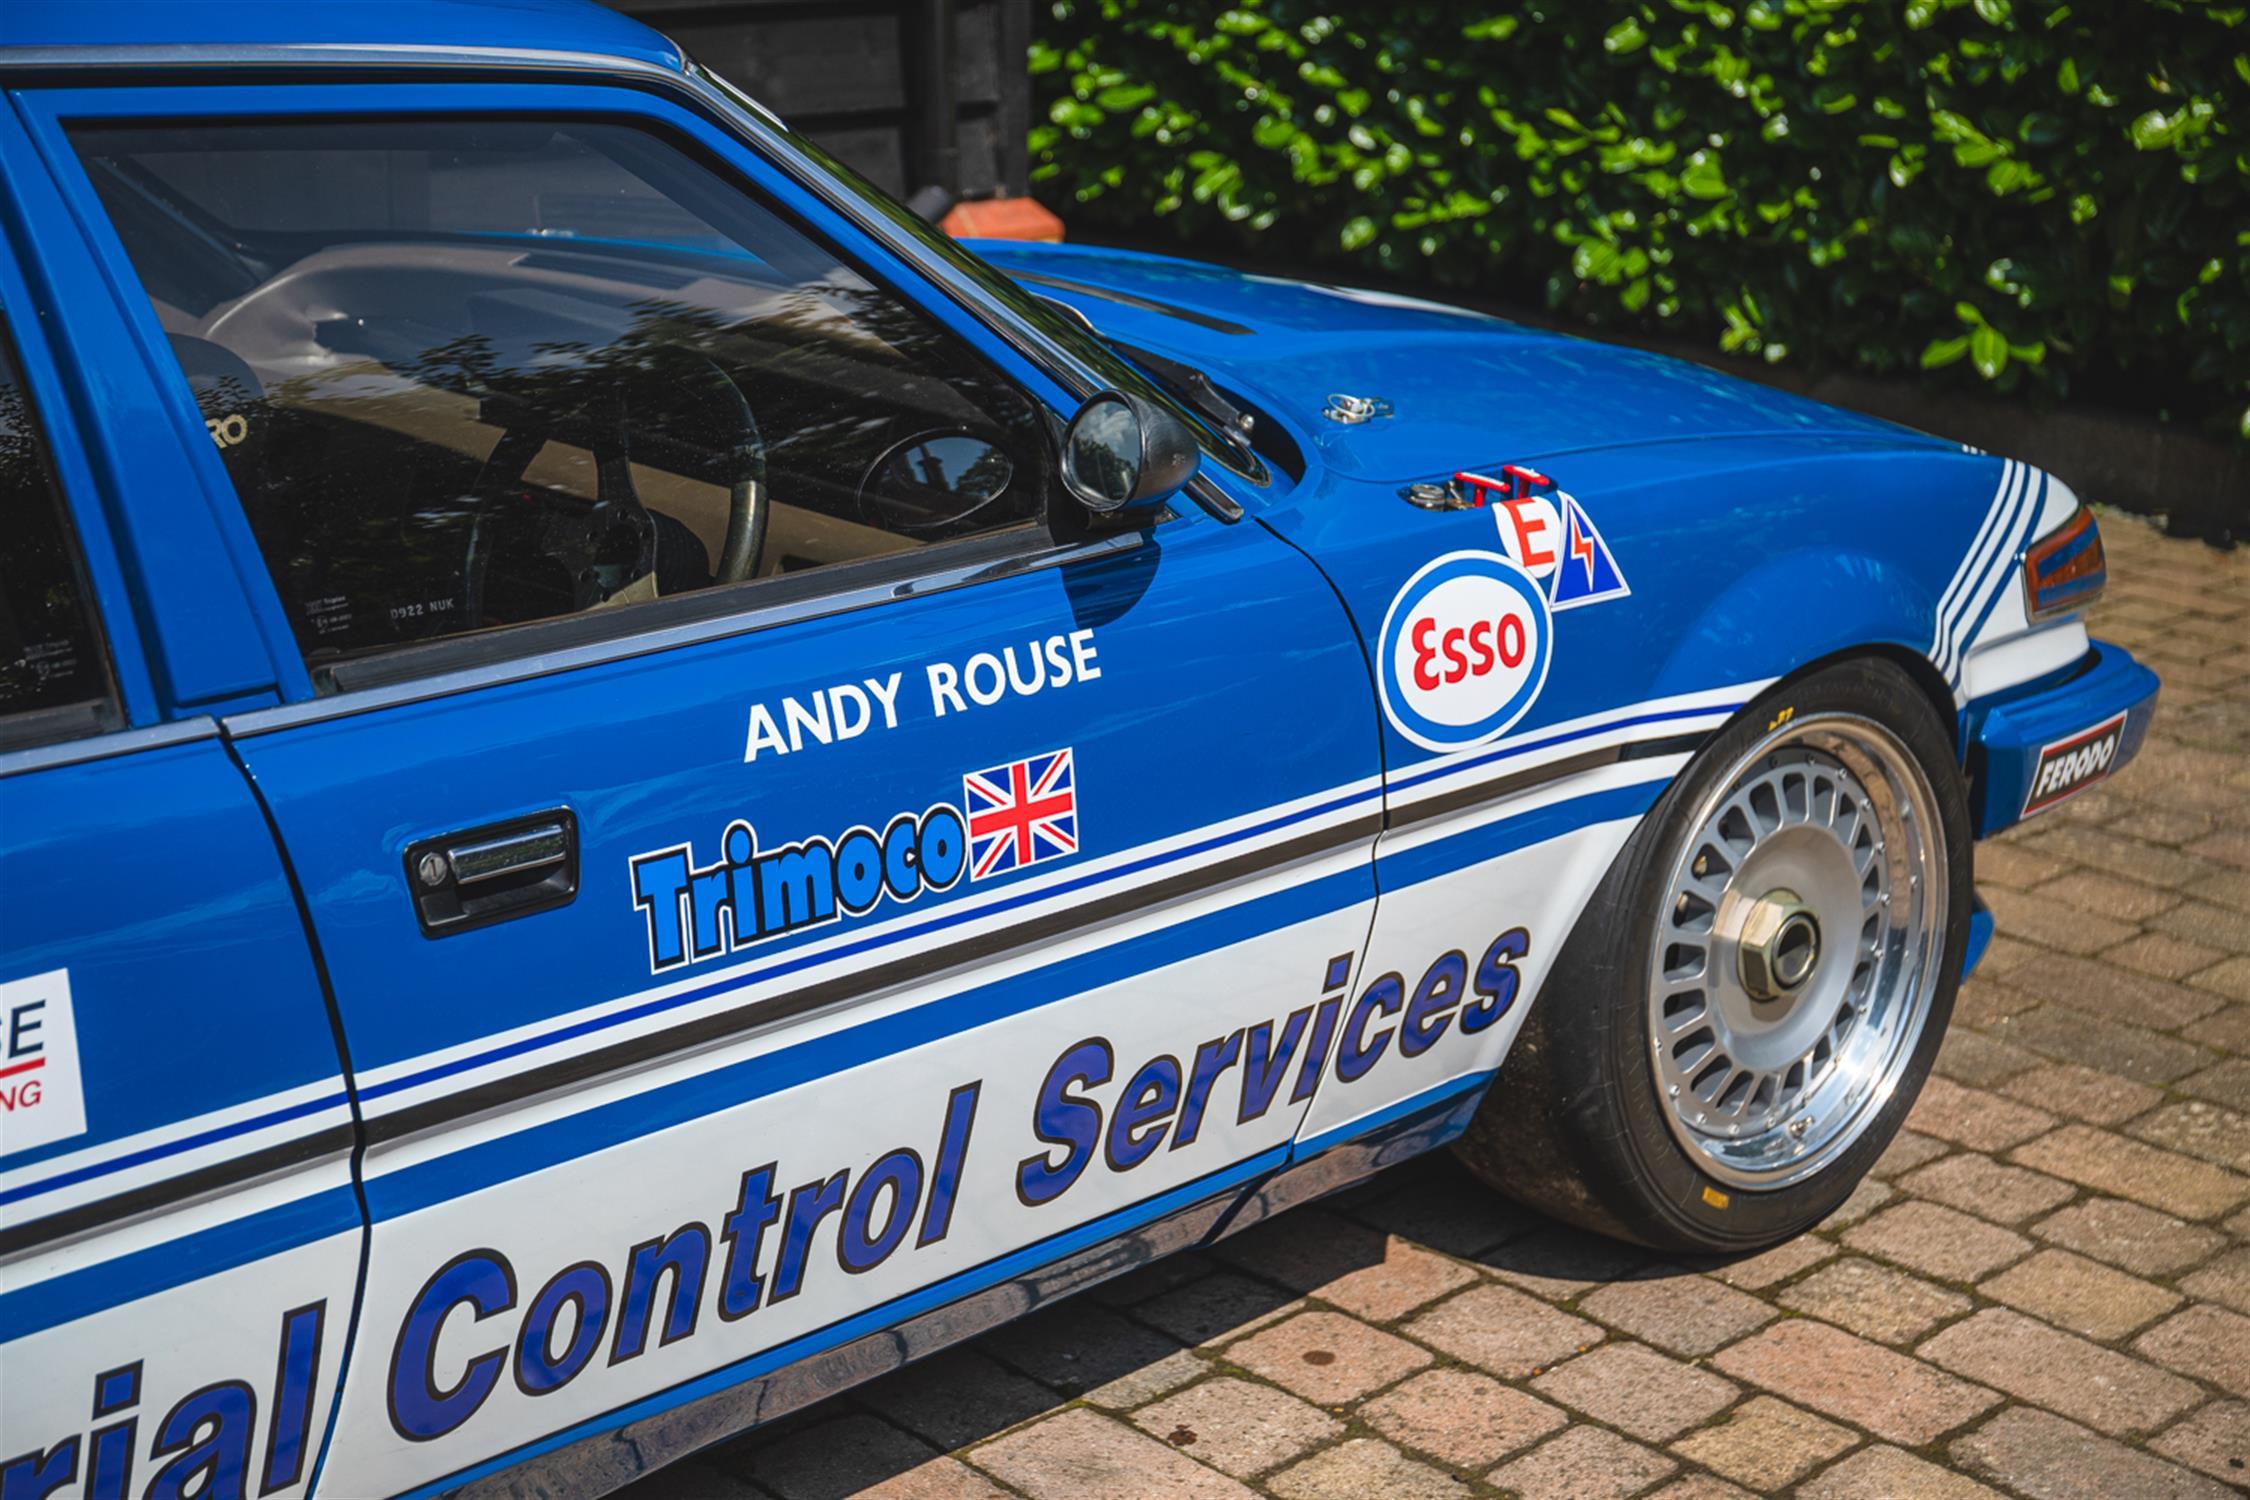 BTCC Championship-Winning 'Group A' ICS Rover Vitesse - Ex-Andy Rouse - Image 7 of 12